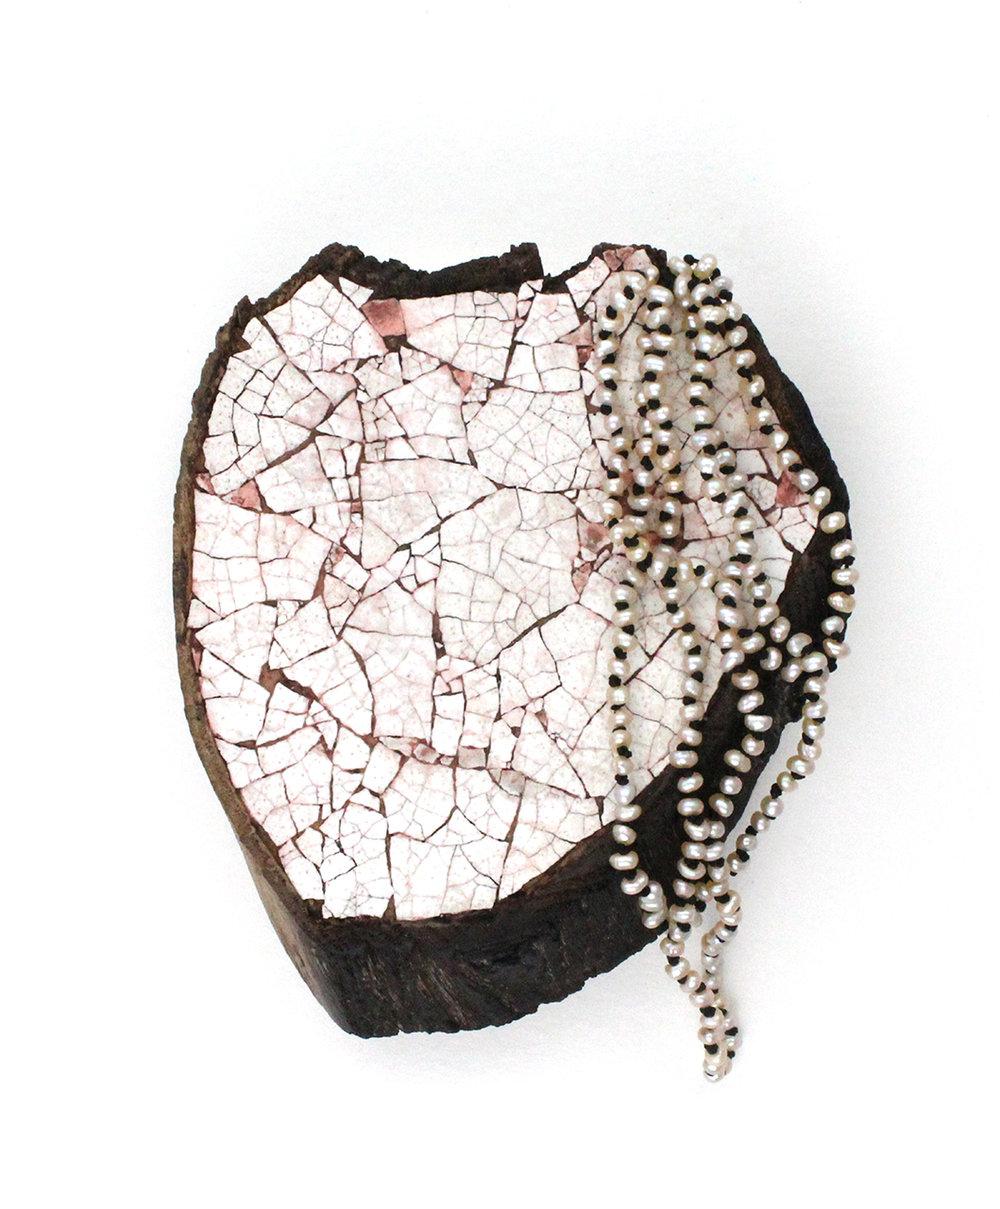 Rachel Andrea Davis | Mourning Brooch No. 2